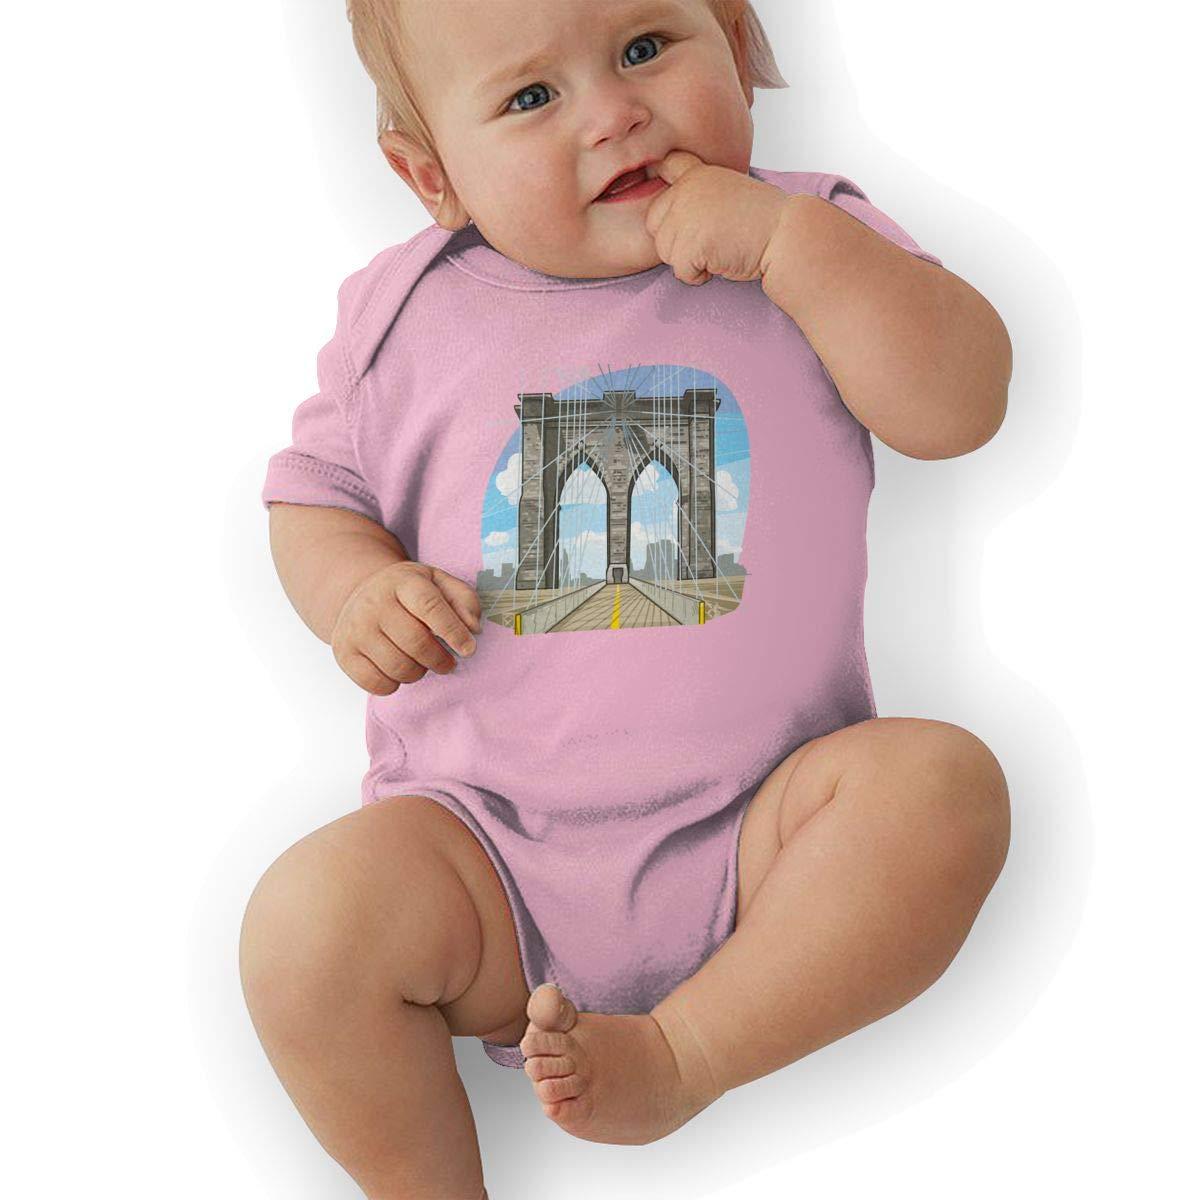 Infant Baby Girls Bodysuit Short-Sleeve Onesie A Wide Bridge Print Outfit Winter Pajamas